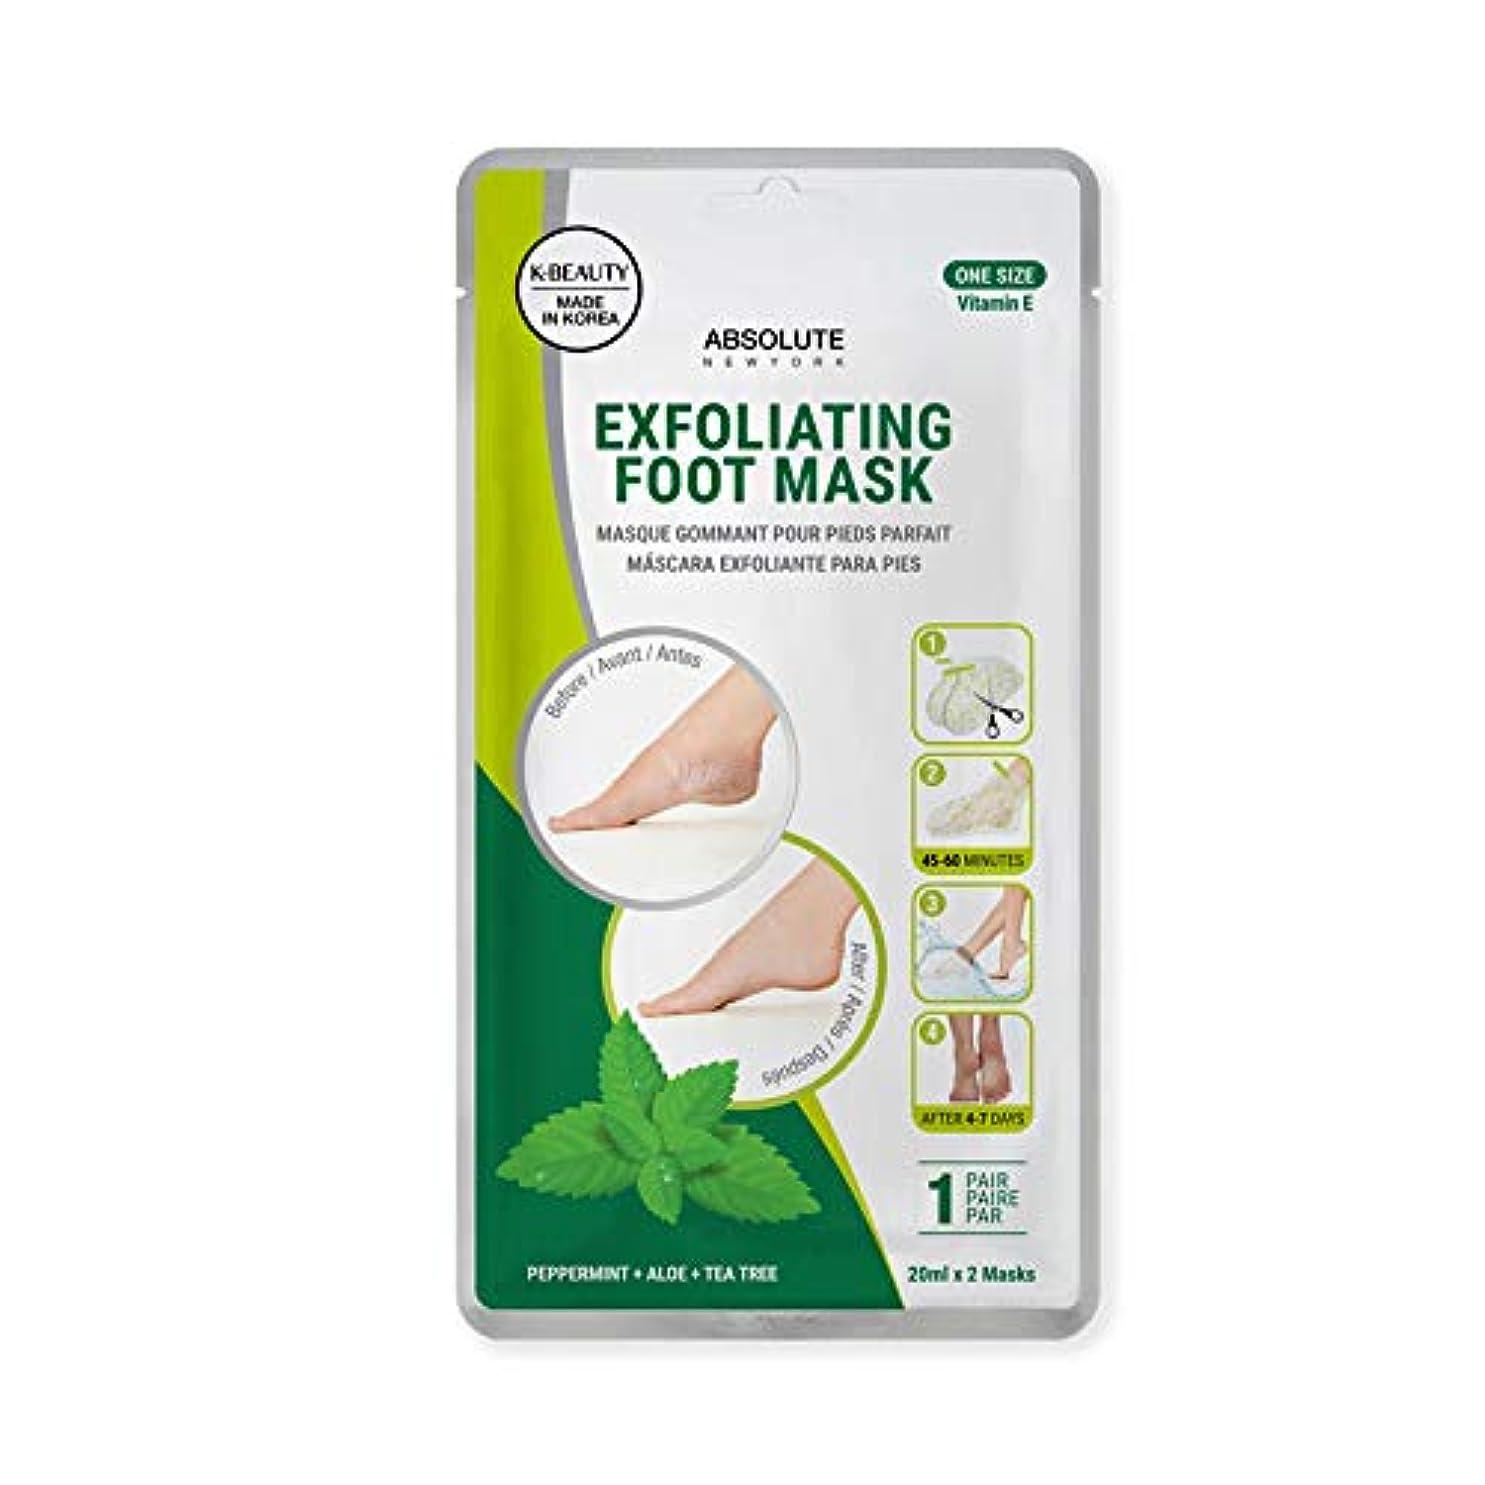 (6 Pack) ABSOLUTE Exfoliating Foot Mask - Peppermint + Aloe + Tea Tree (並行輸入品)